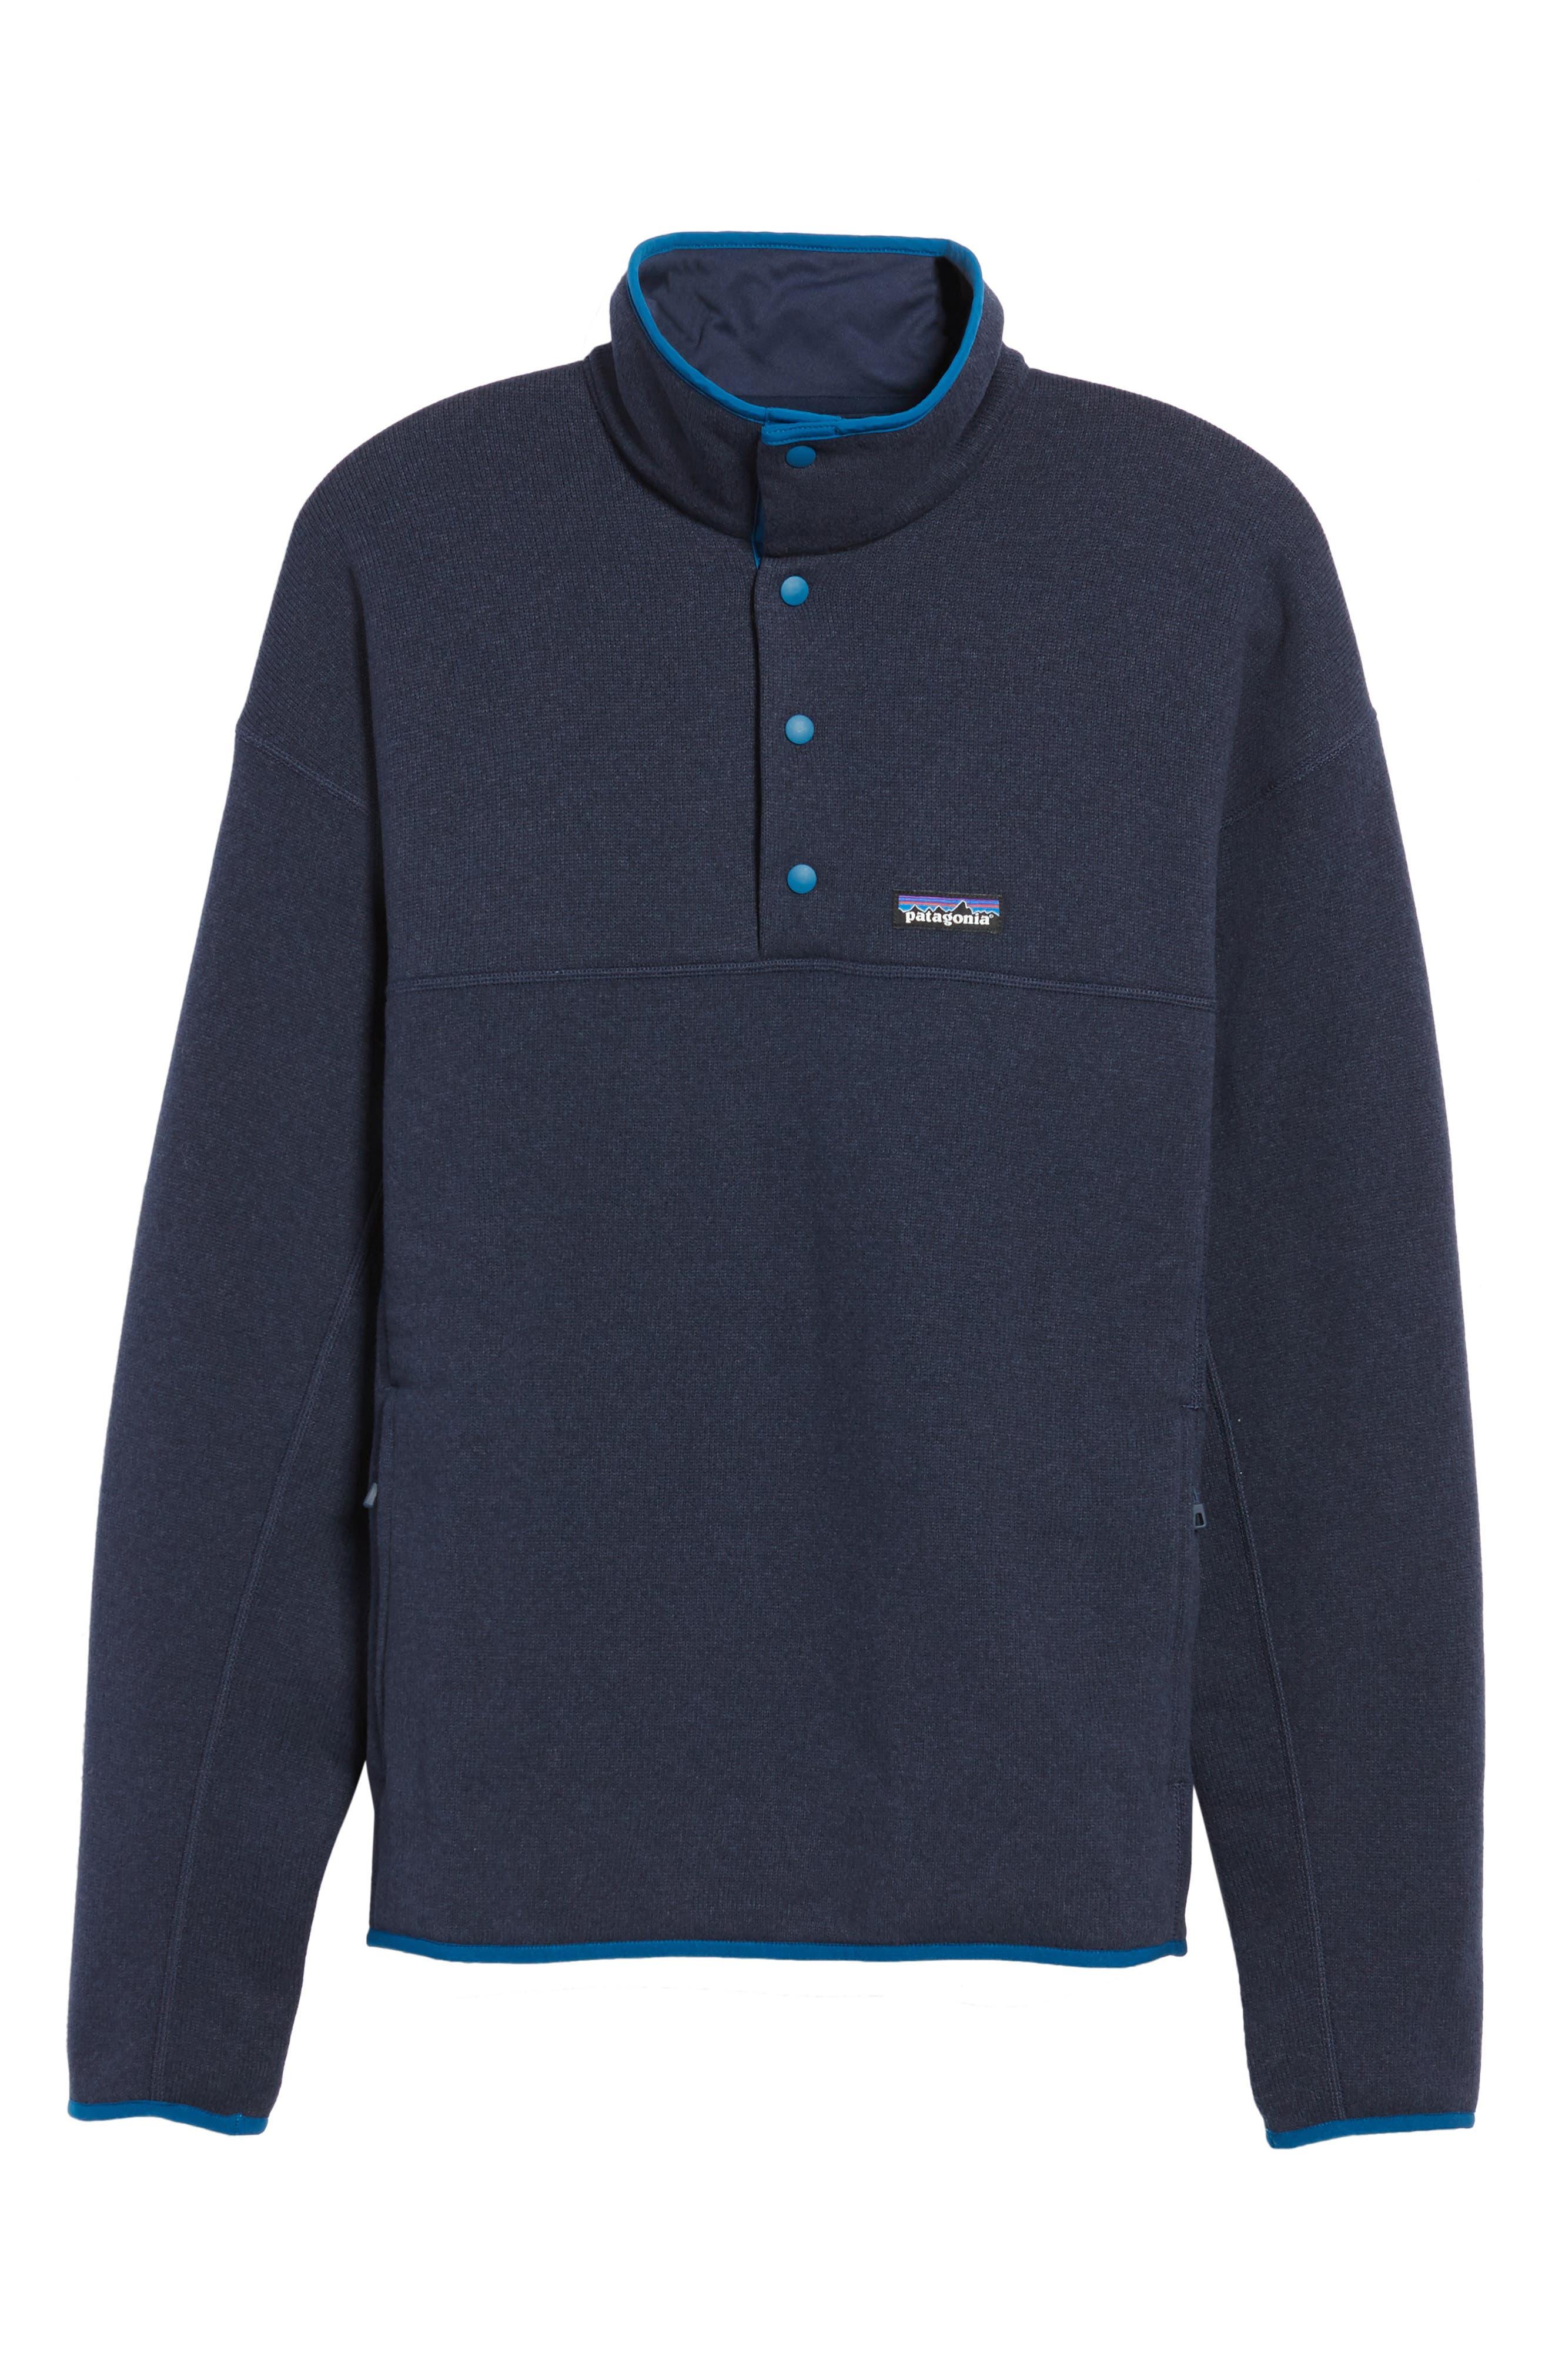 Lightweight Better Sweater Pullover,                             Alternate thumbnail 6, color,                             Navy Blue